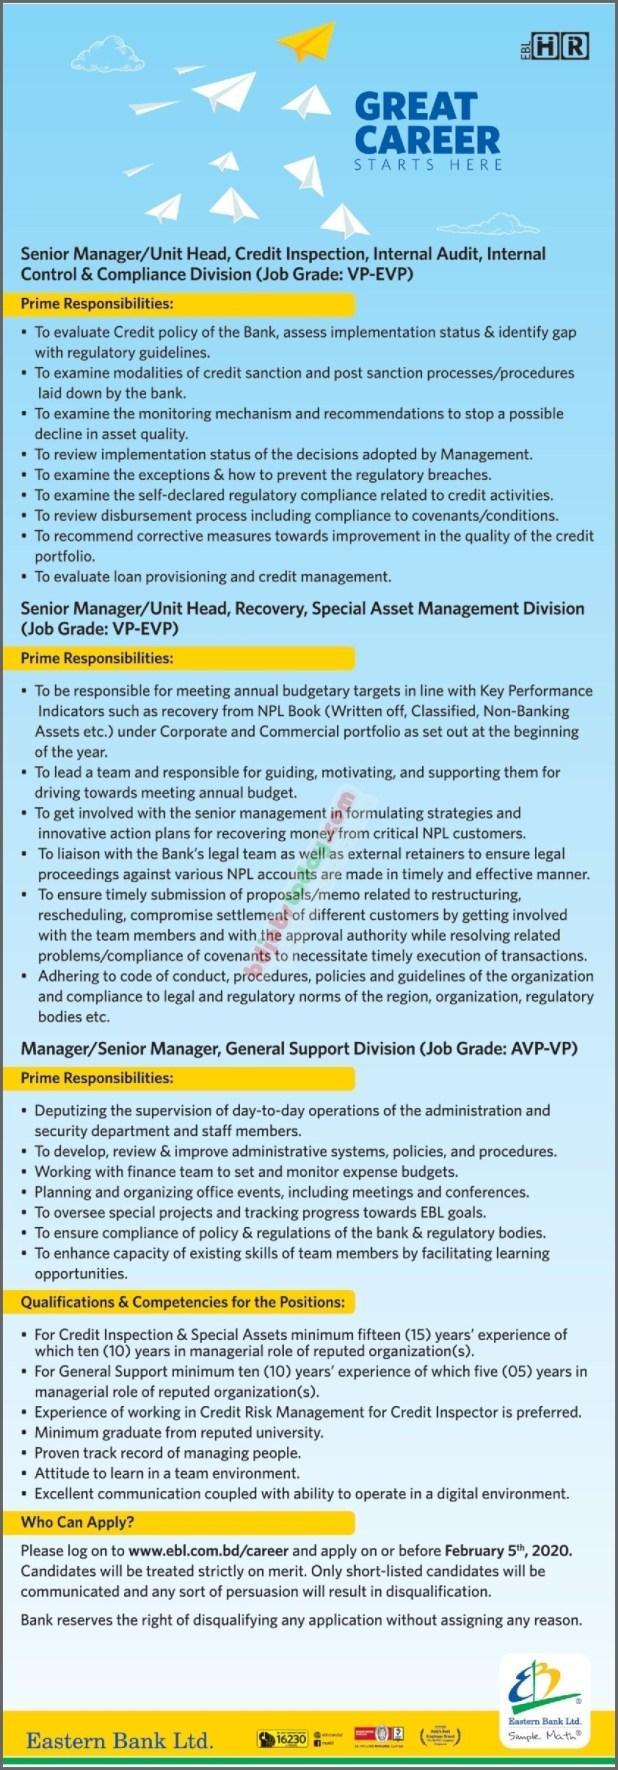 Eastern Bank Job Circular 2020